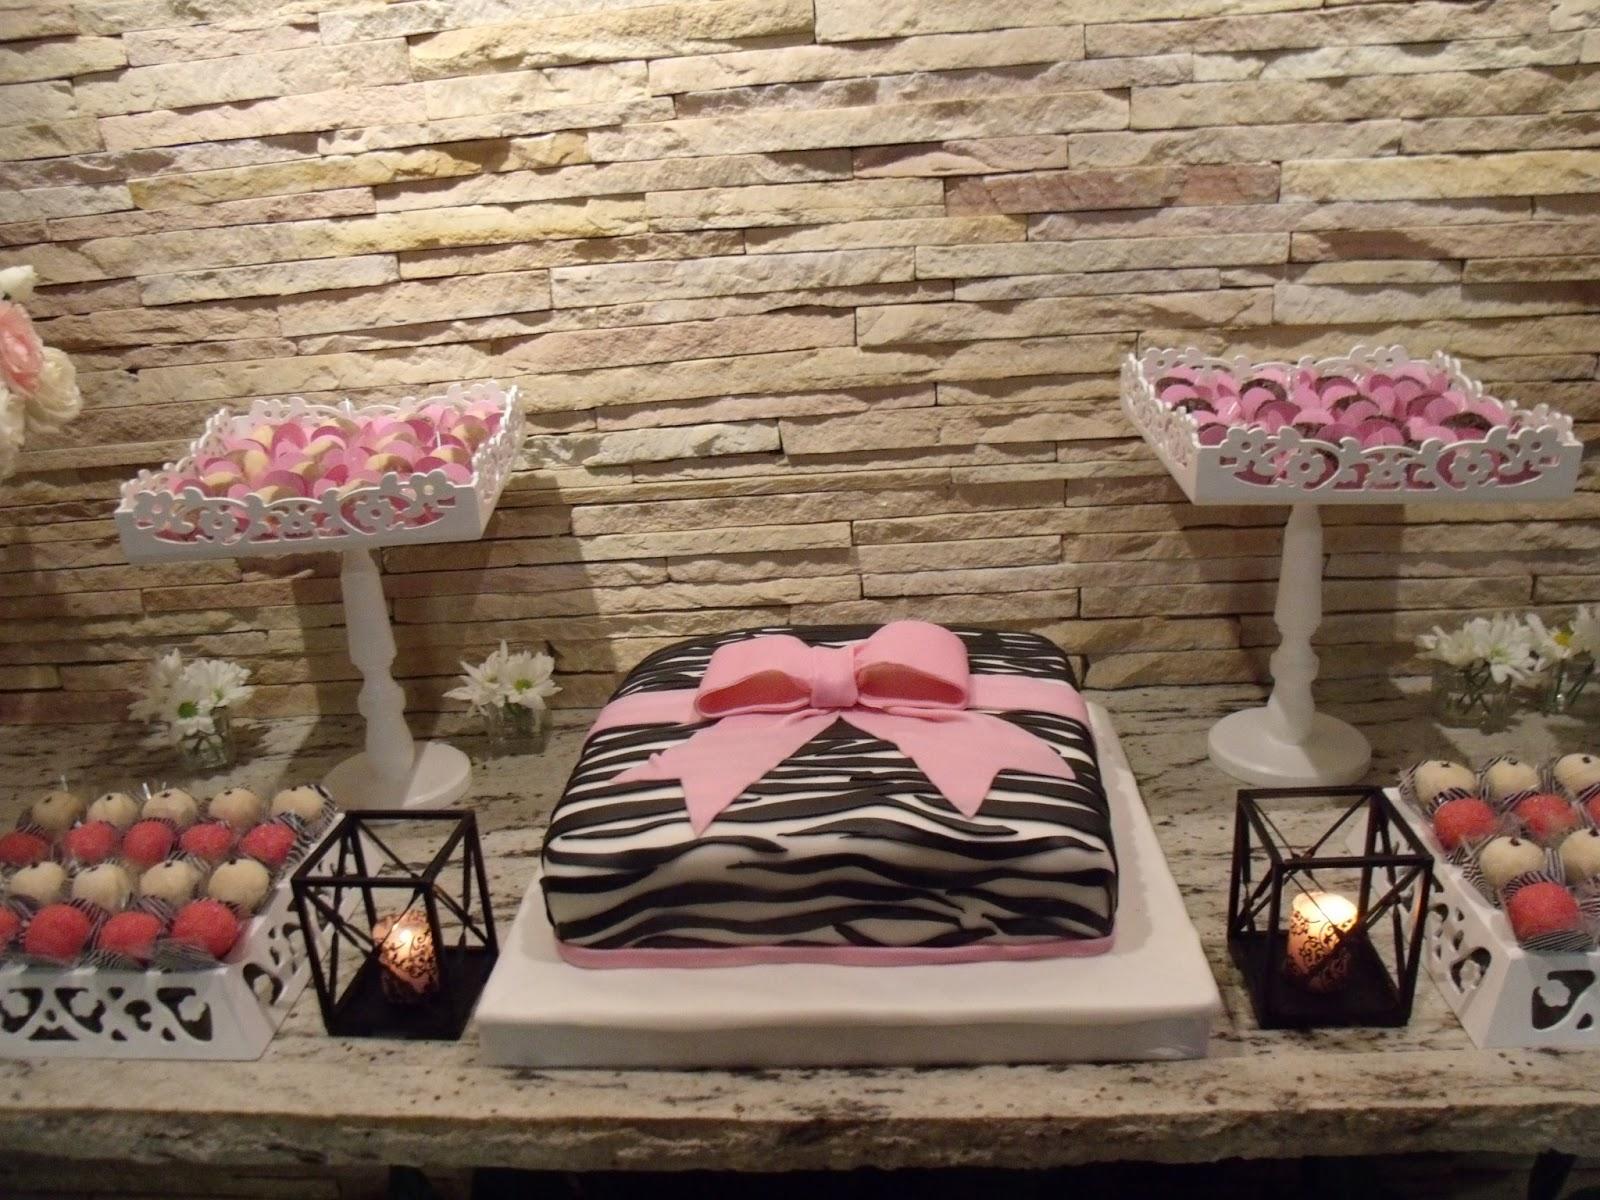 festa da zebra pink car interior design. Black Bedroom Furniture Sets. Home Design Ideas